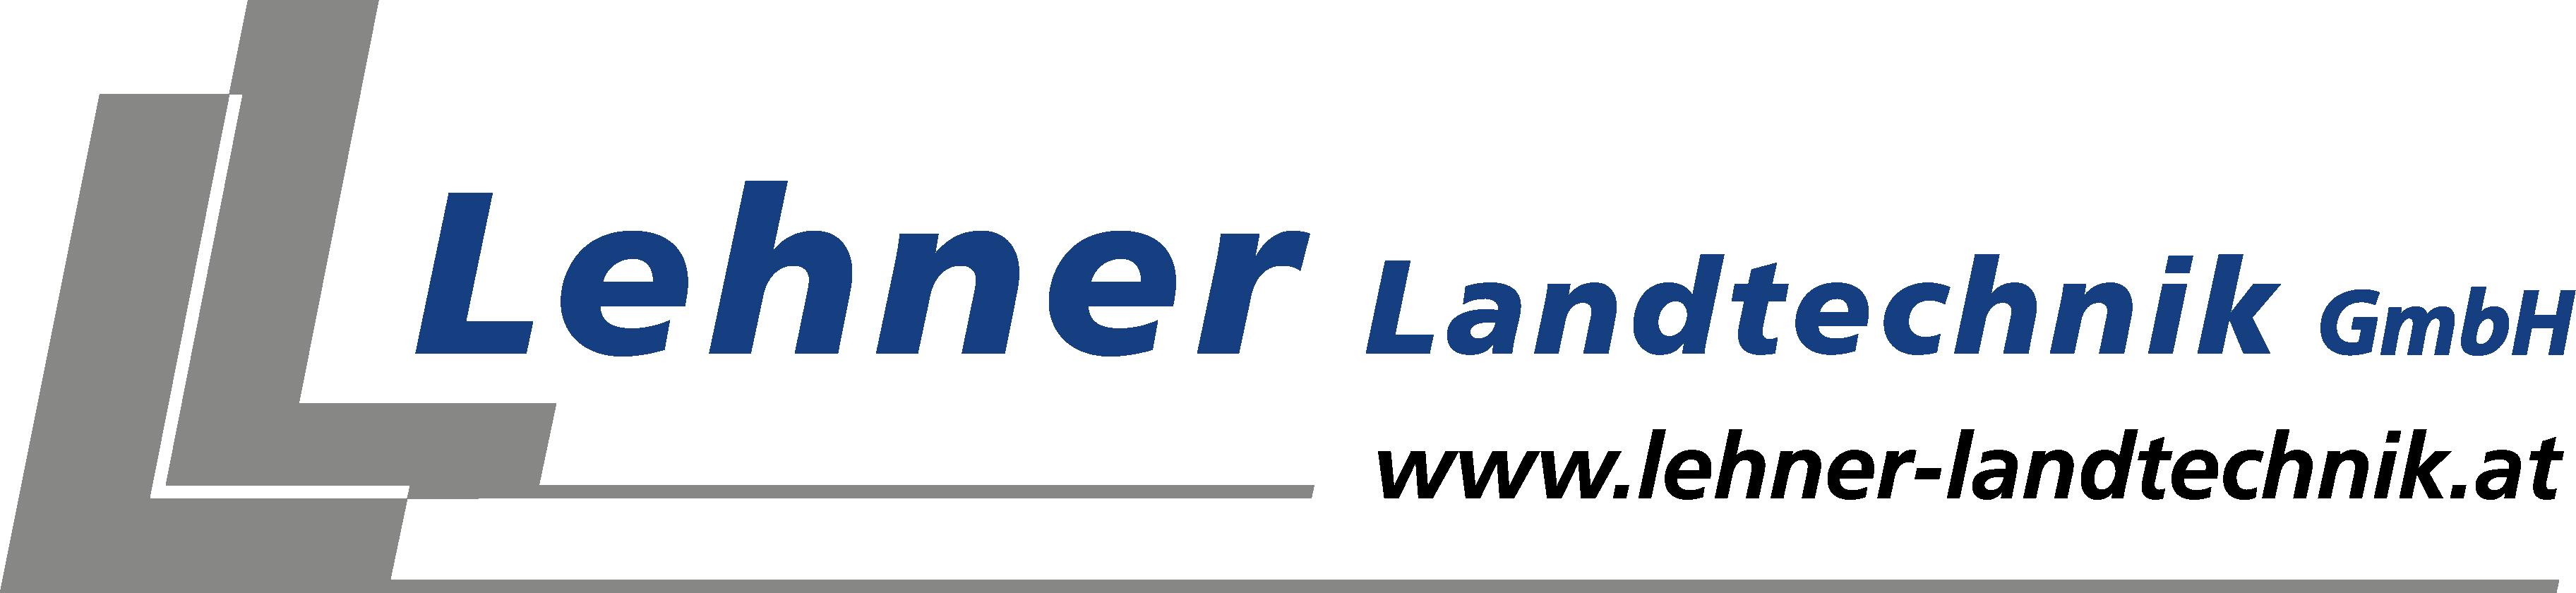 Logo Lehner Landtechnik